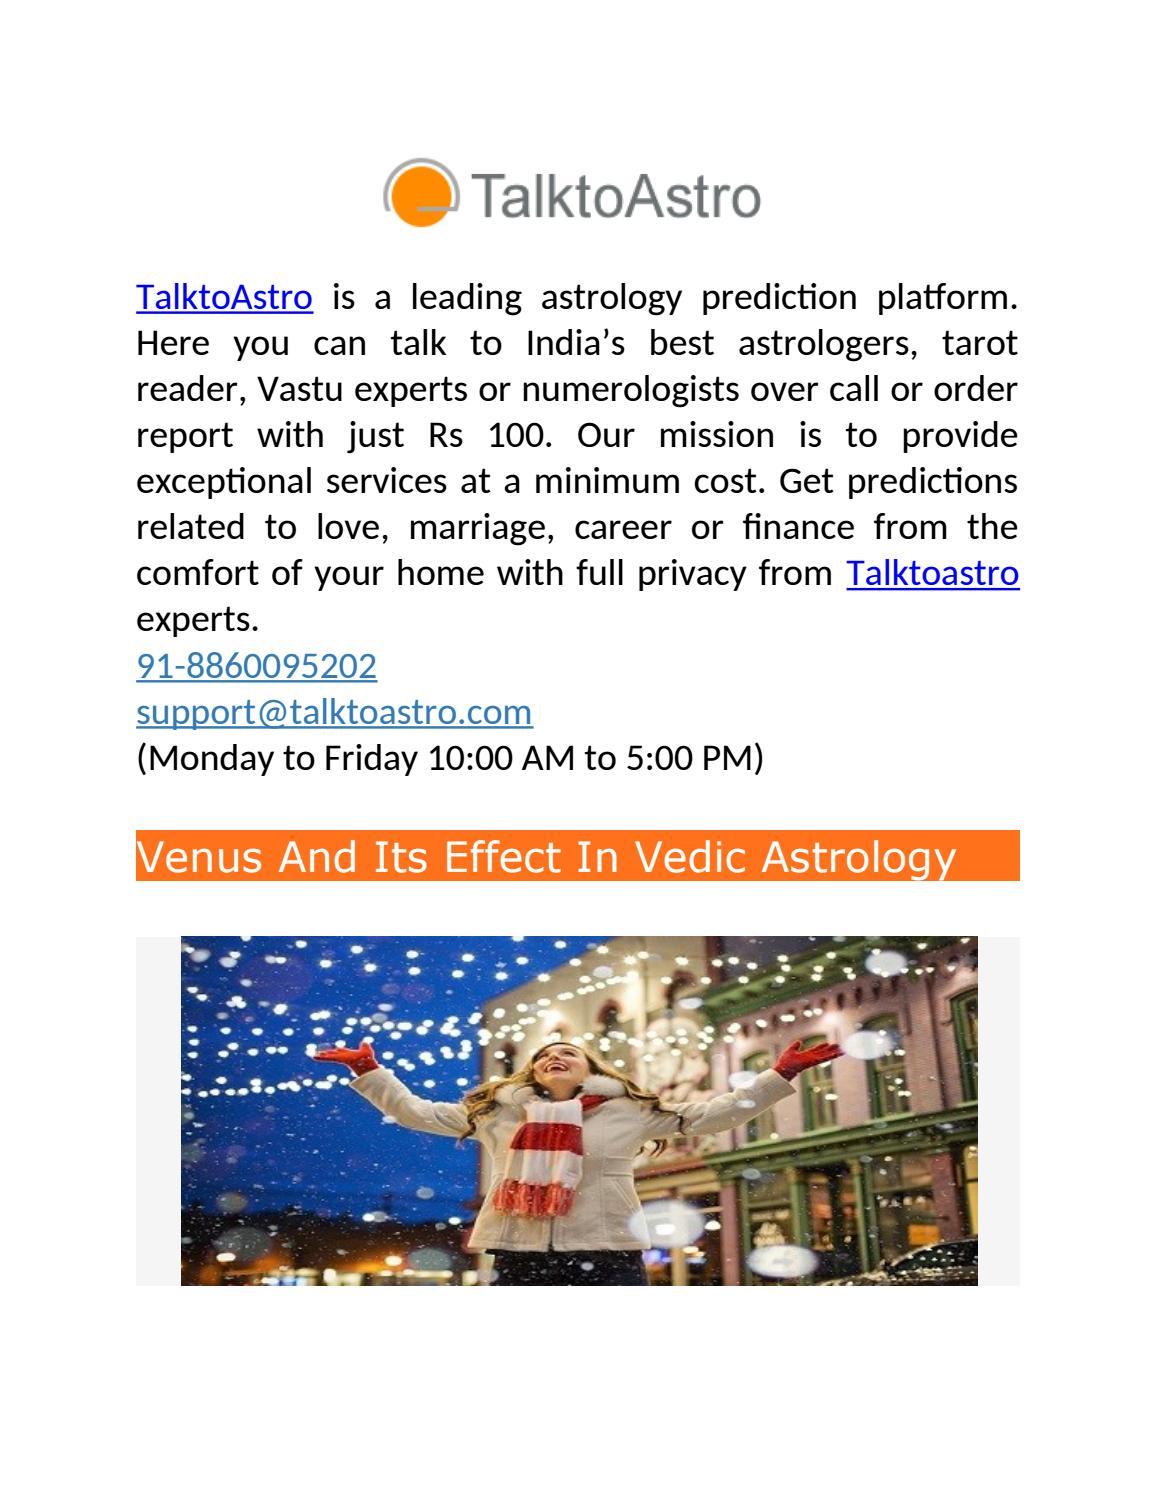 TalktoAstro by ratreechowdhury76 - issuu